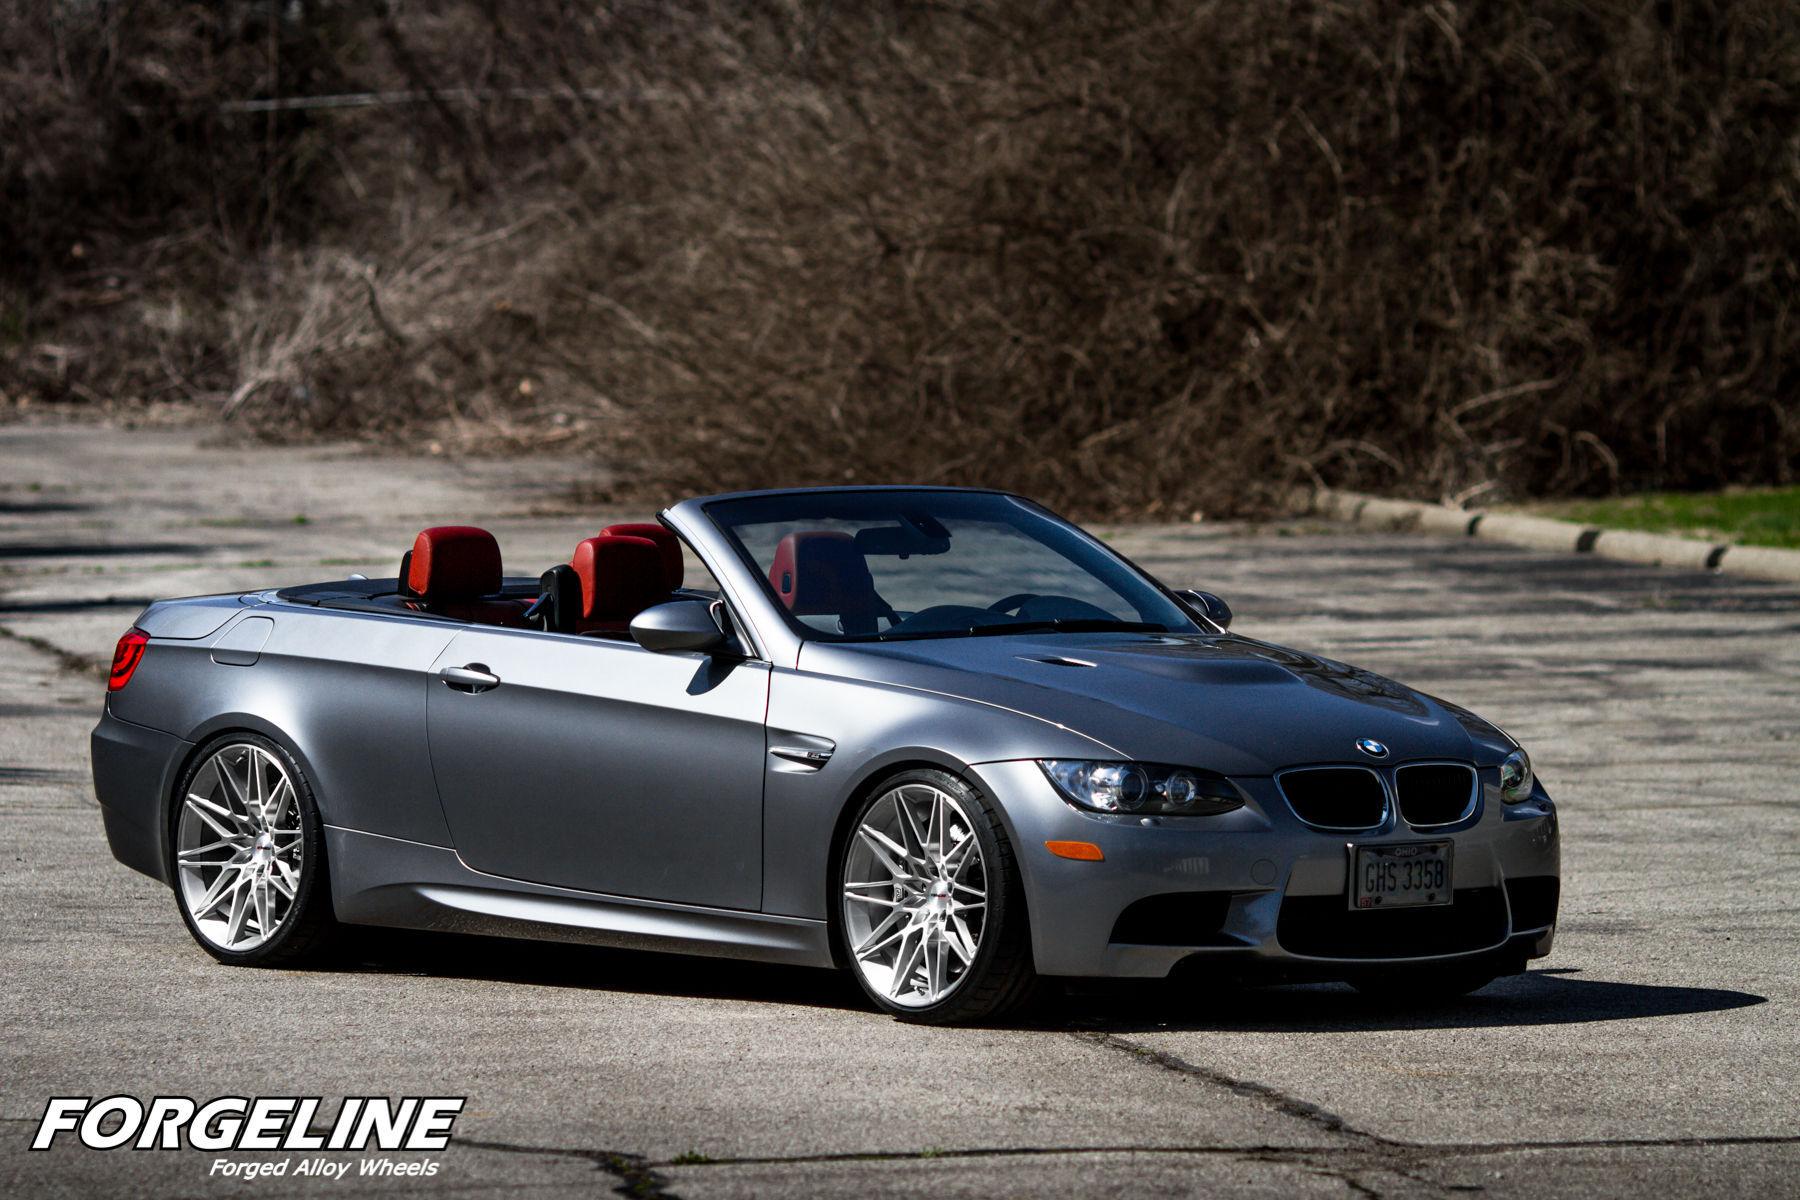 2011 BMW M3 | Sherri Schardt's BMW E92 M3 Convertible on Forgeline One Piece Forged Monoblock MT1 Wheels